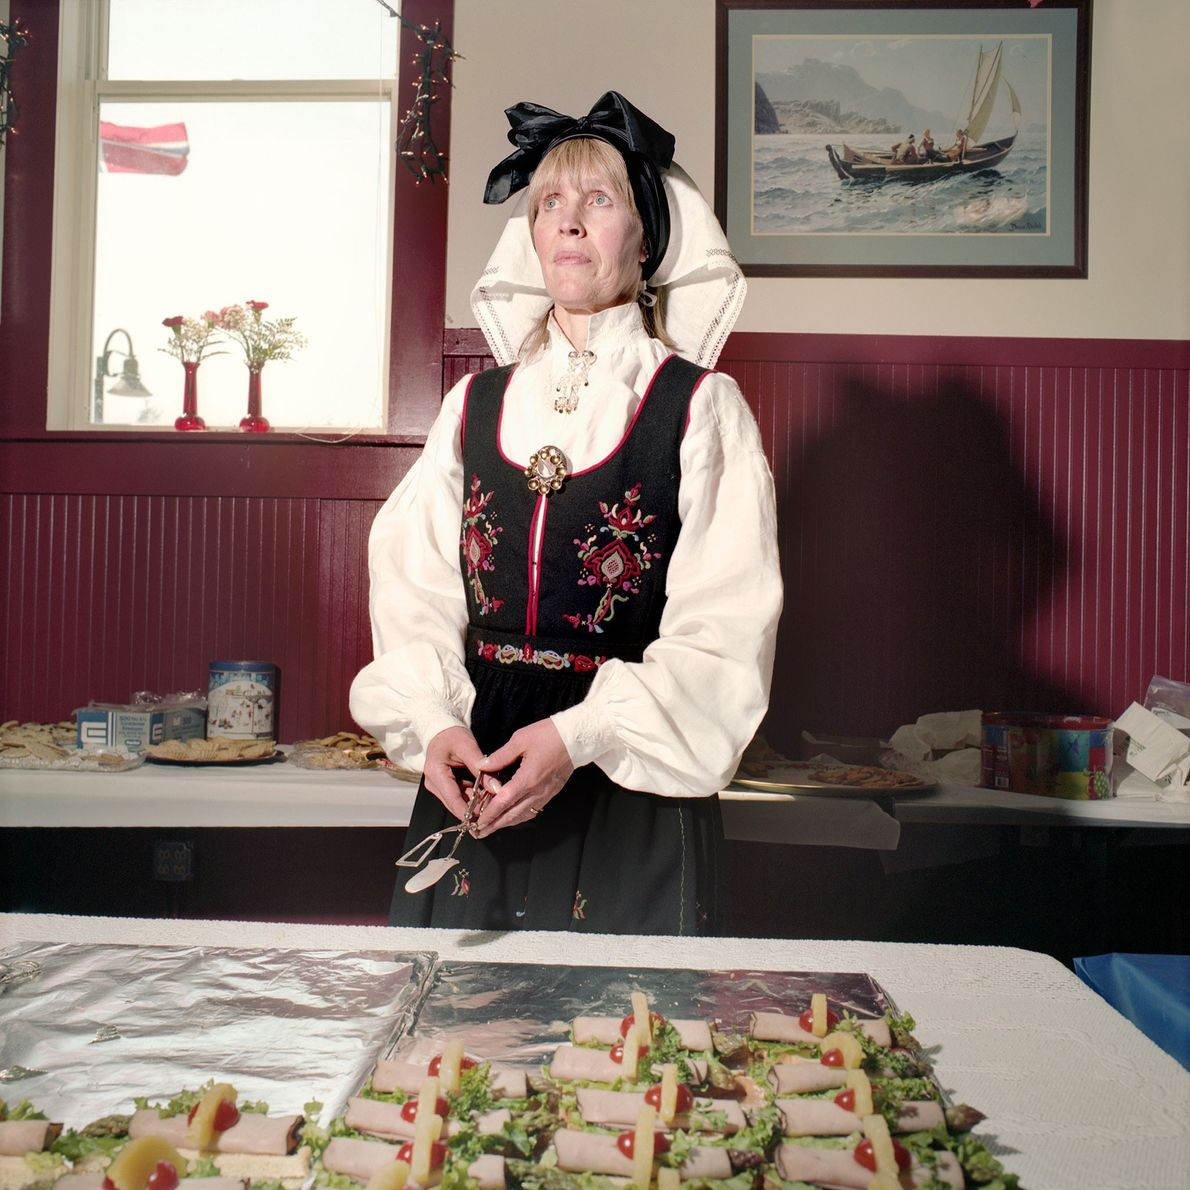 Frau in Tracht vor Buffet